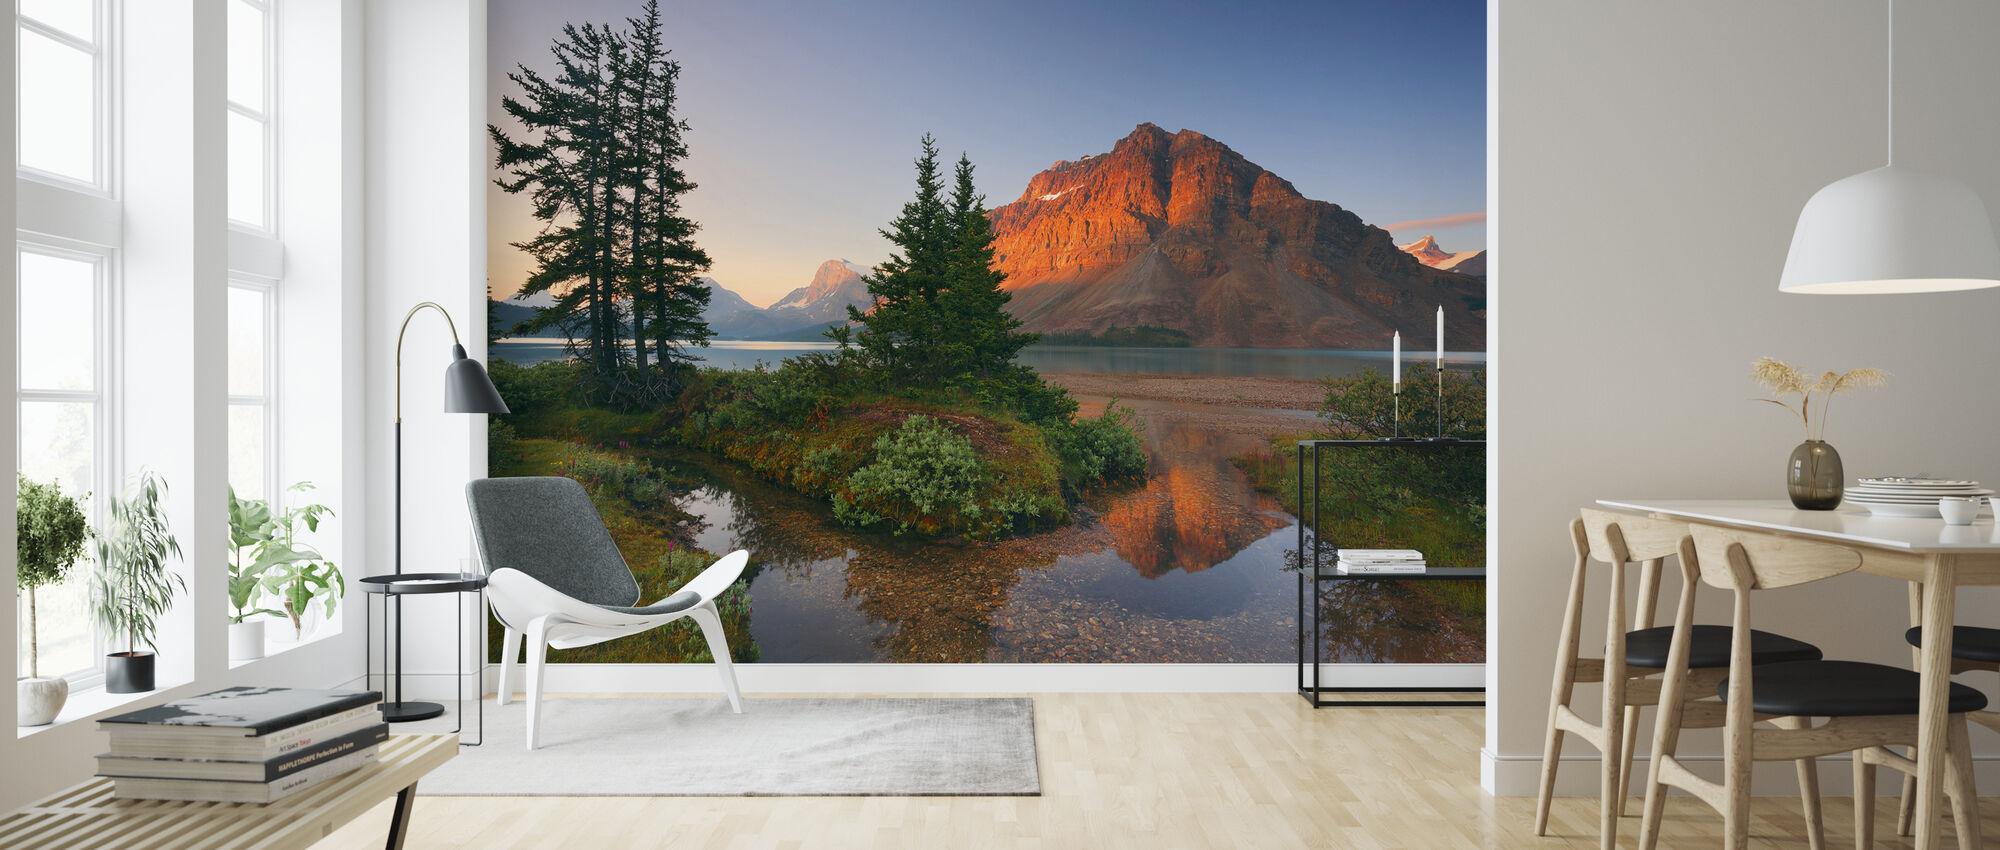 Crowfoot Mountain Reflection - Wallpaper - Living Room